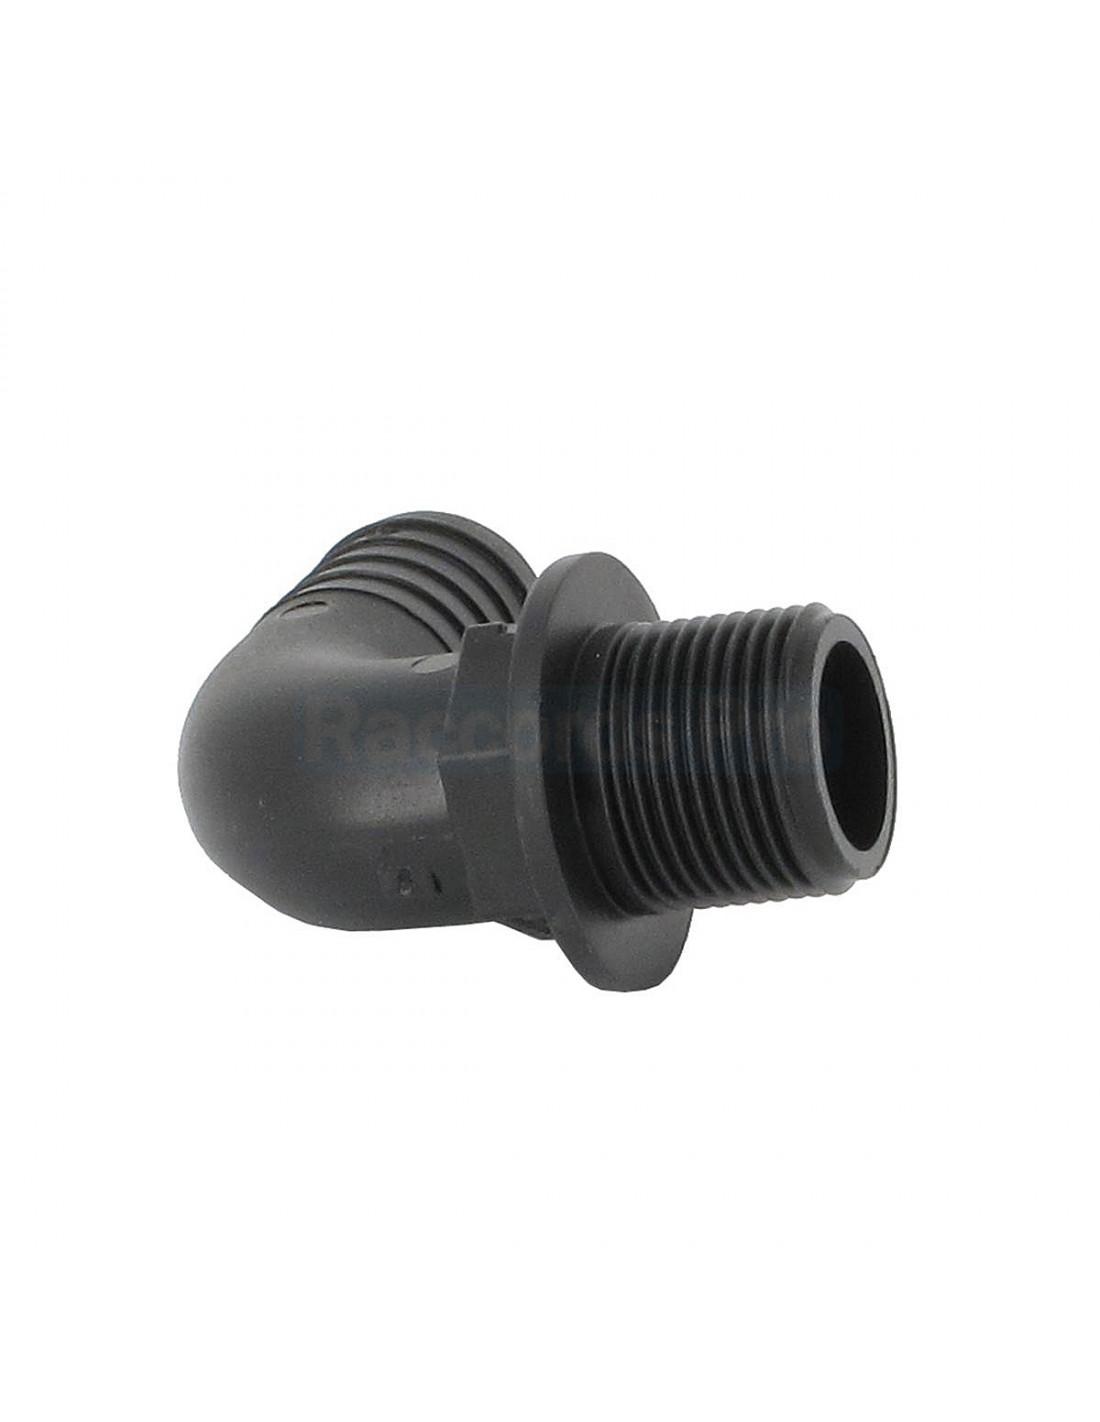 raccord cannel coud 25 mm m 3 4 pas gaz sarl axesspack. Black Bedroom Furniture Sets. Home Design Ideas